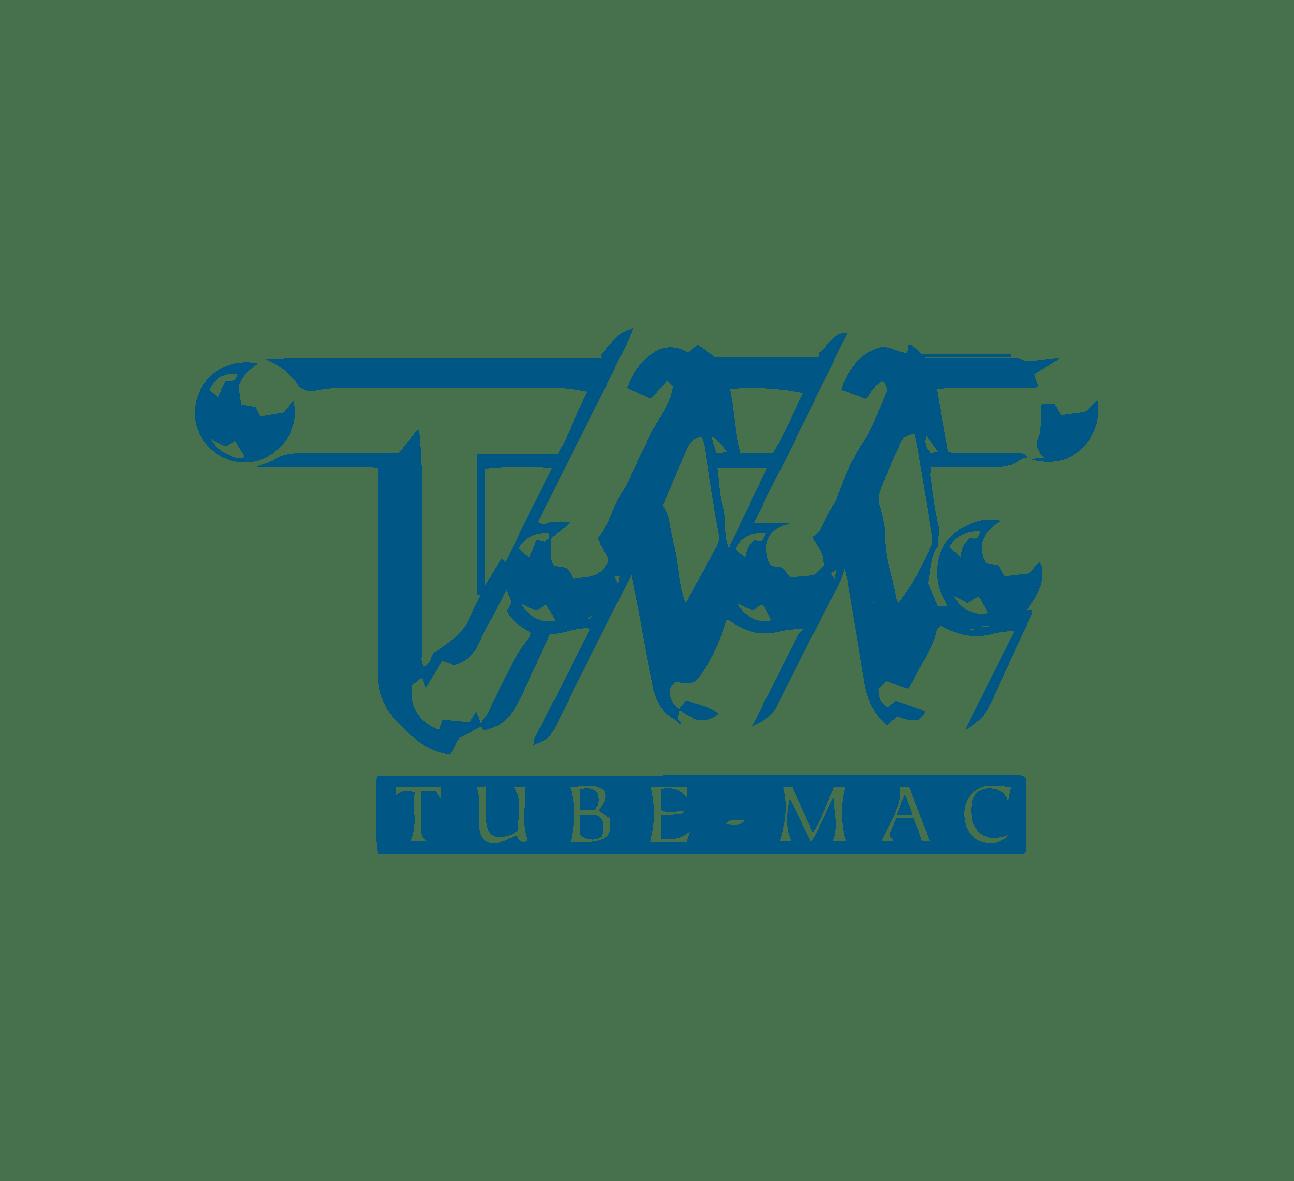 Tubemac - Clientes